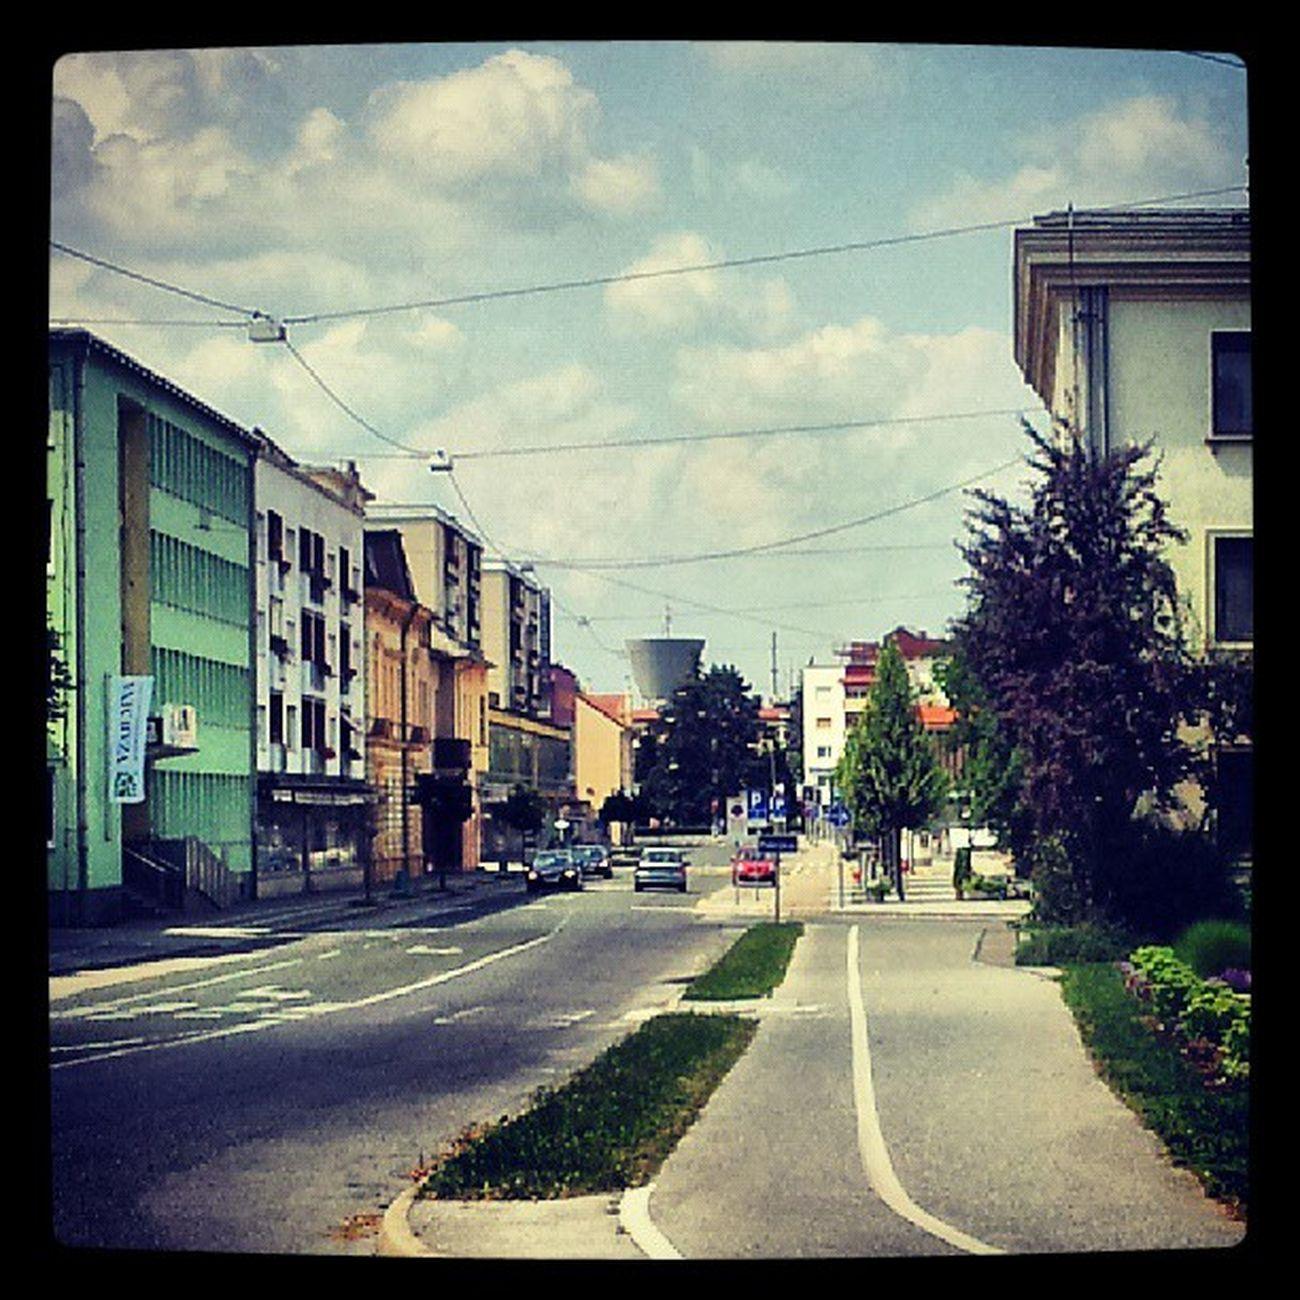 Igslovenia Murska Sobota Slovenská ulica titova glavna potrosnik porodisnica